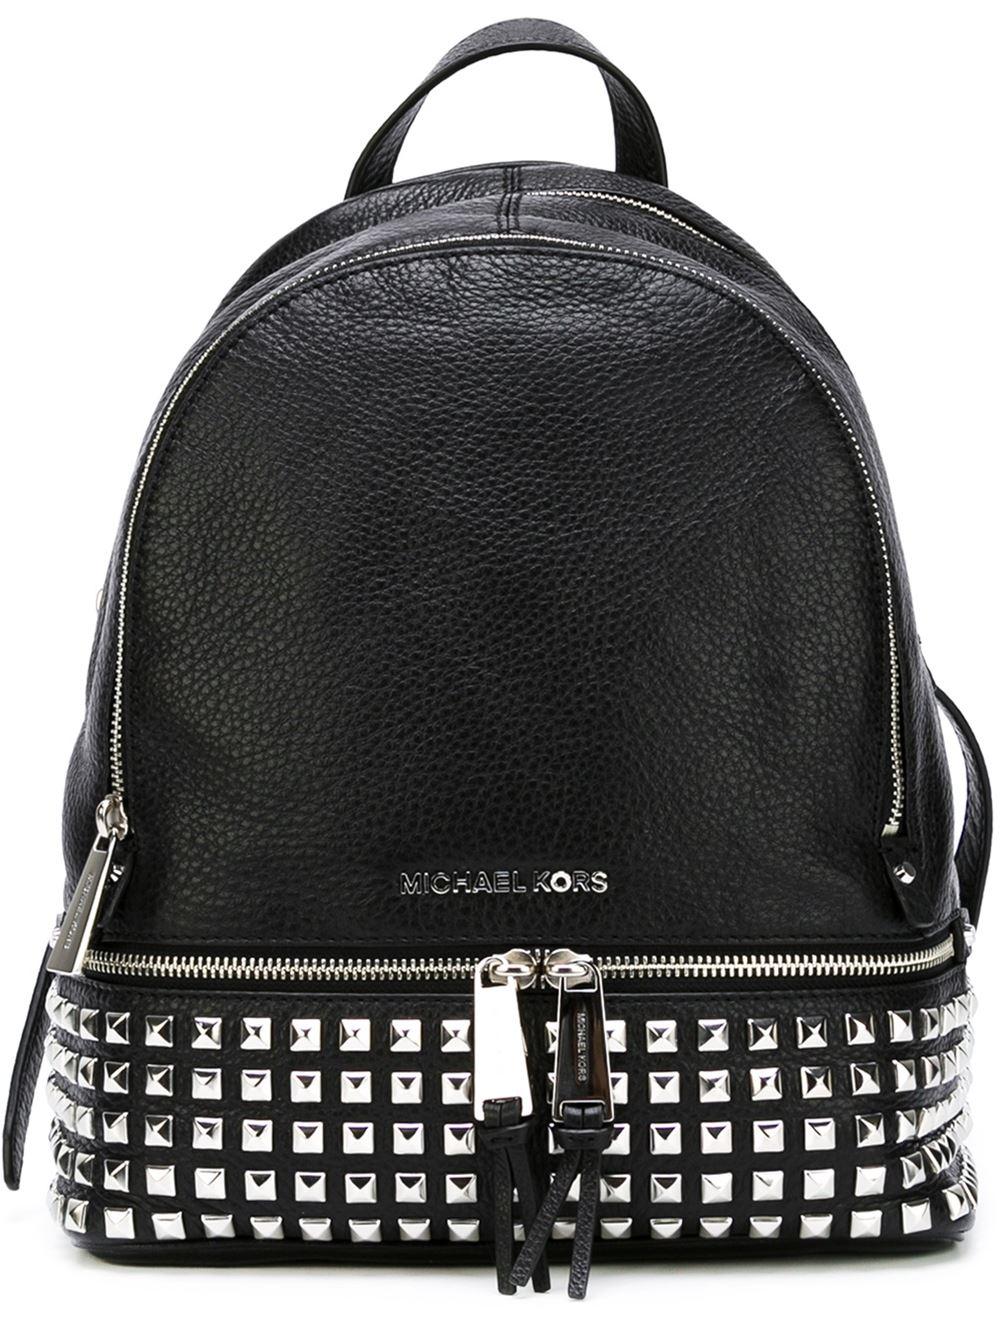 michael michael kors rhea studded backpack in black lyst. Black Bedroom Furniture Sets. Home Design Ideas